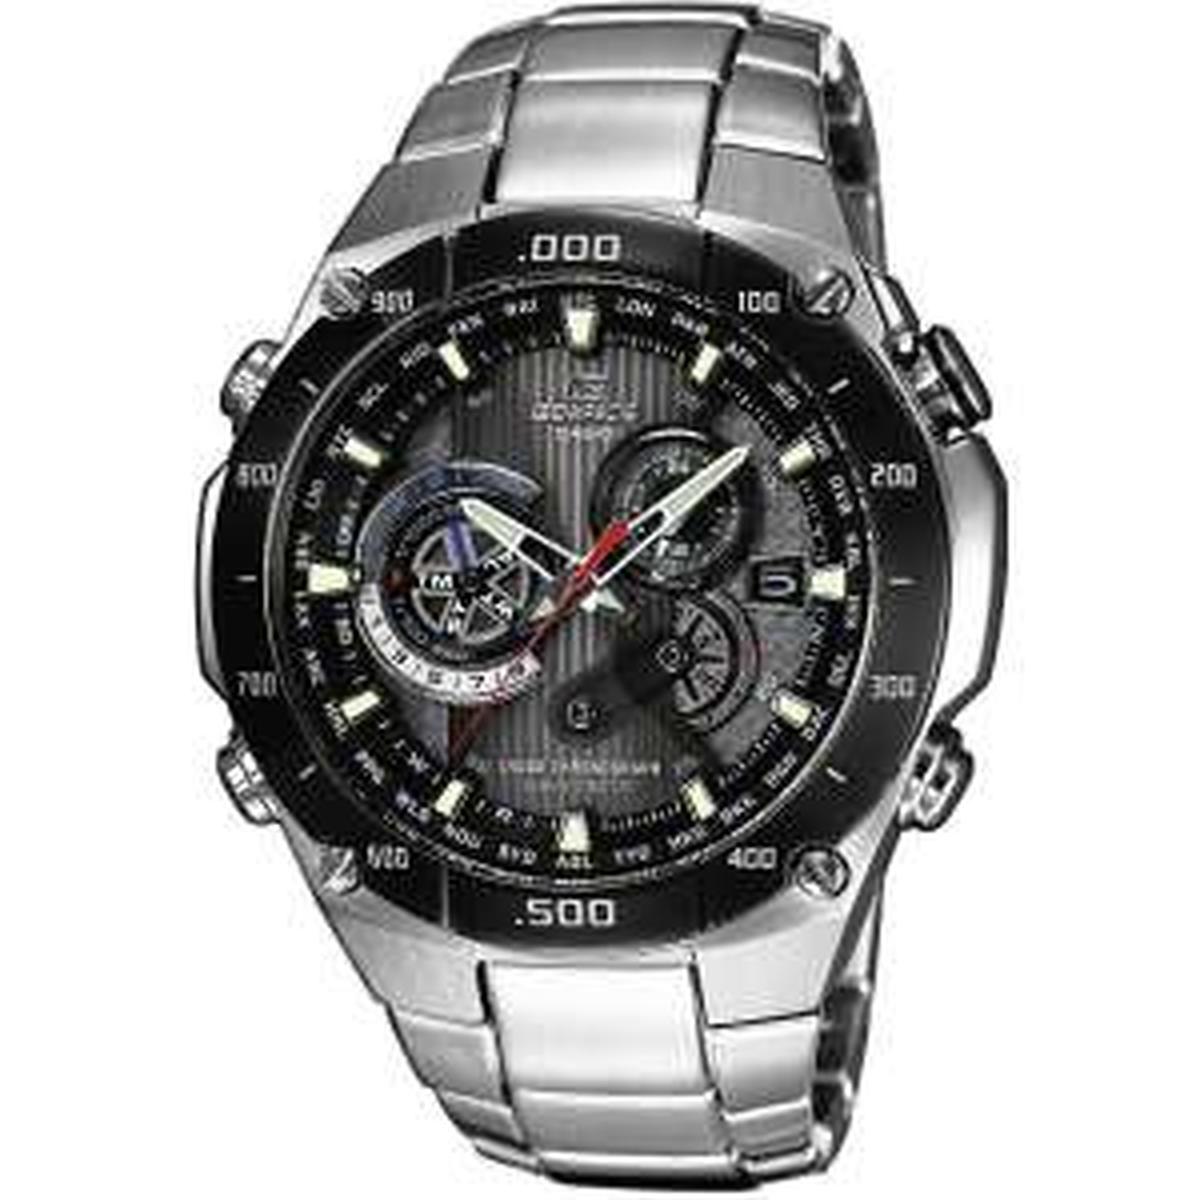 Casio Herren-Armbanduhr Funk Solar Chrono Edifice EQWM1100DB1AER für 124,15€ [Karstadt]